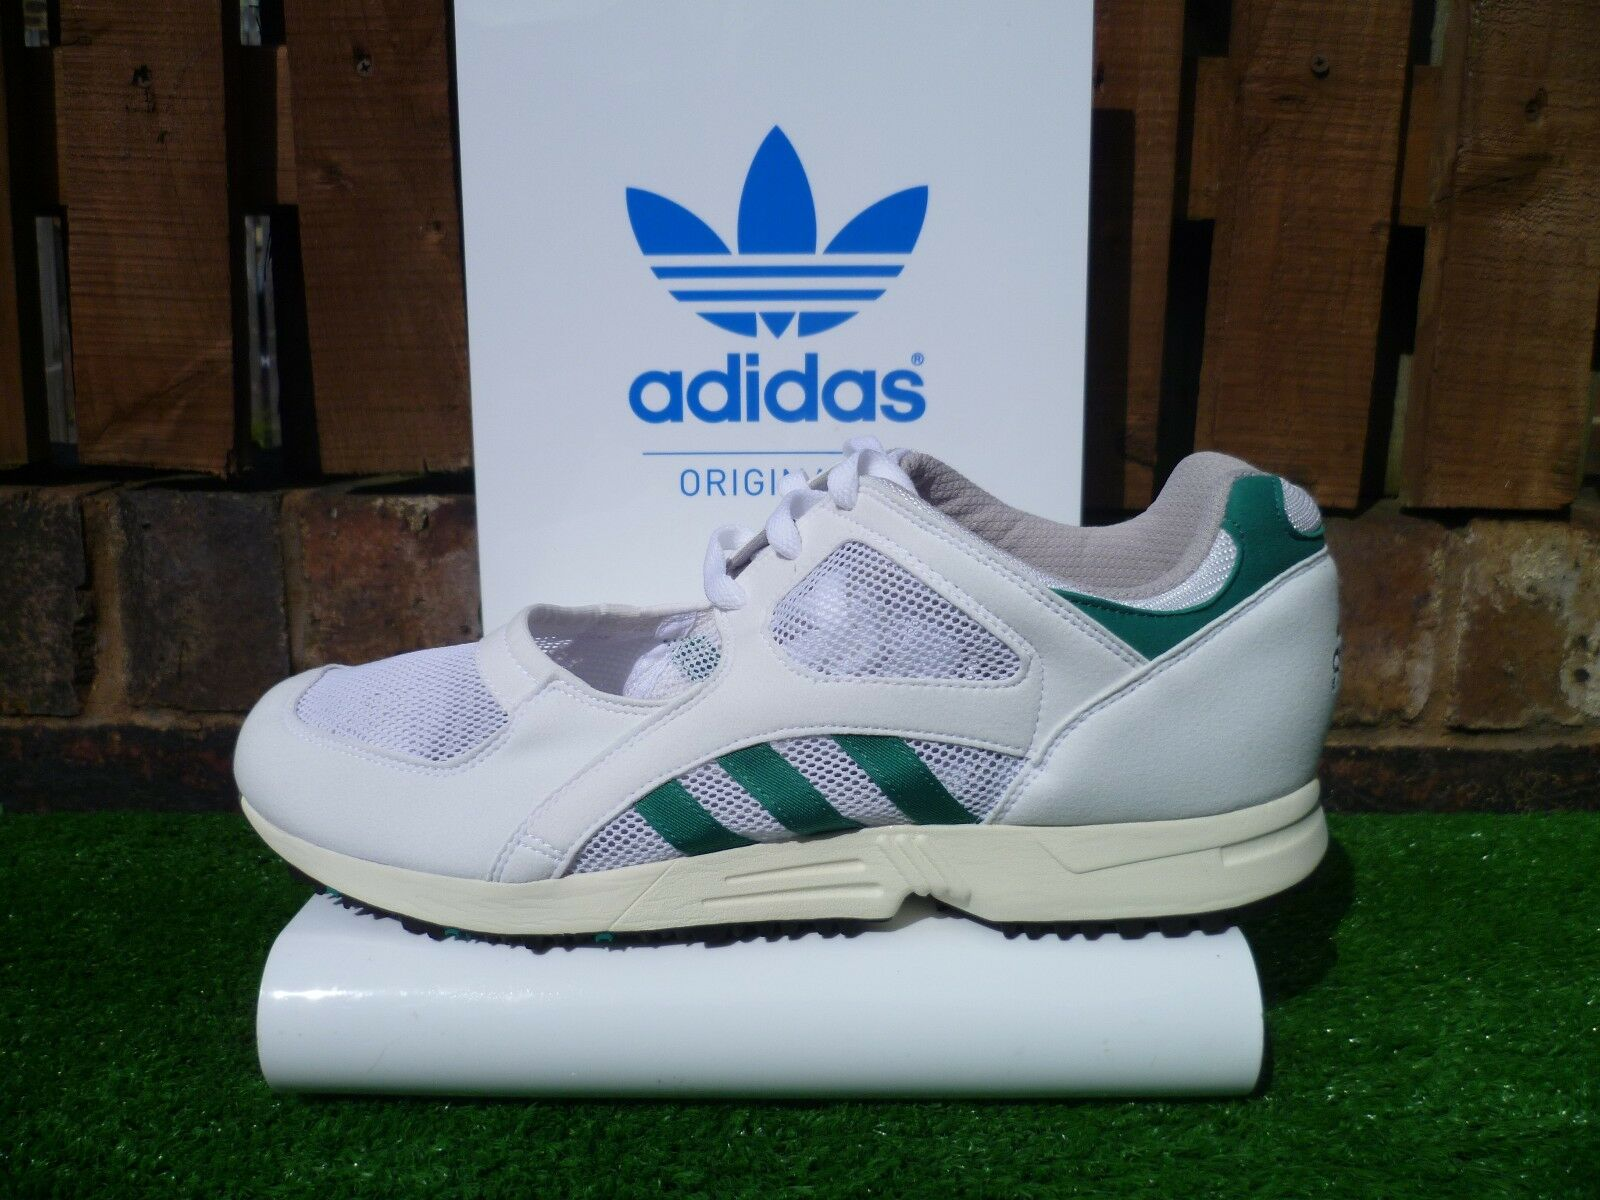 Adidas EQUIPMENT RACING 1991 OG 2014 UK 11 BNIB  2014 OG RARE LOOK EQT 90'S RUNNERS 5781b9